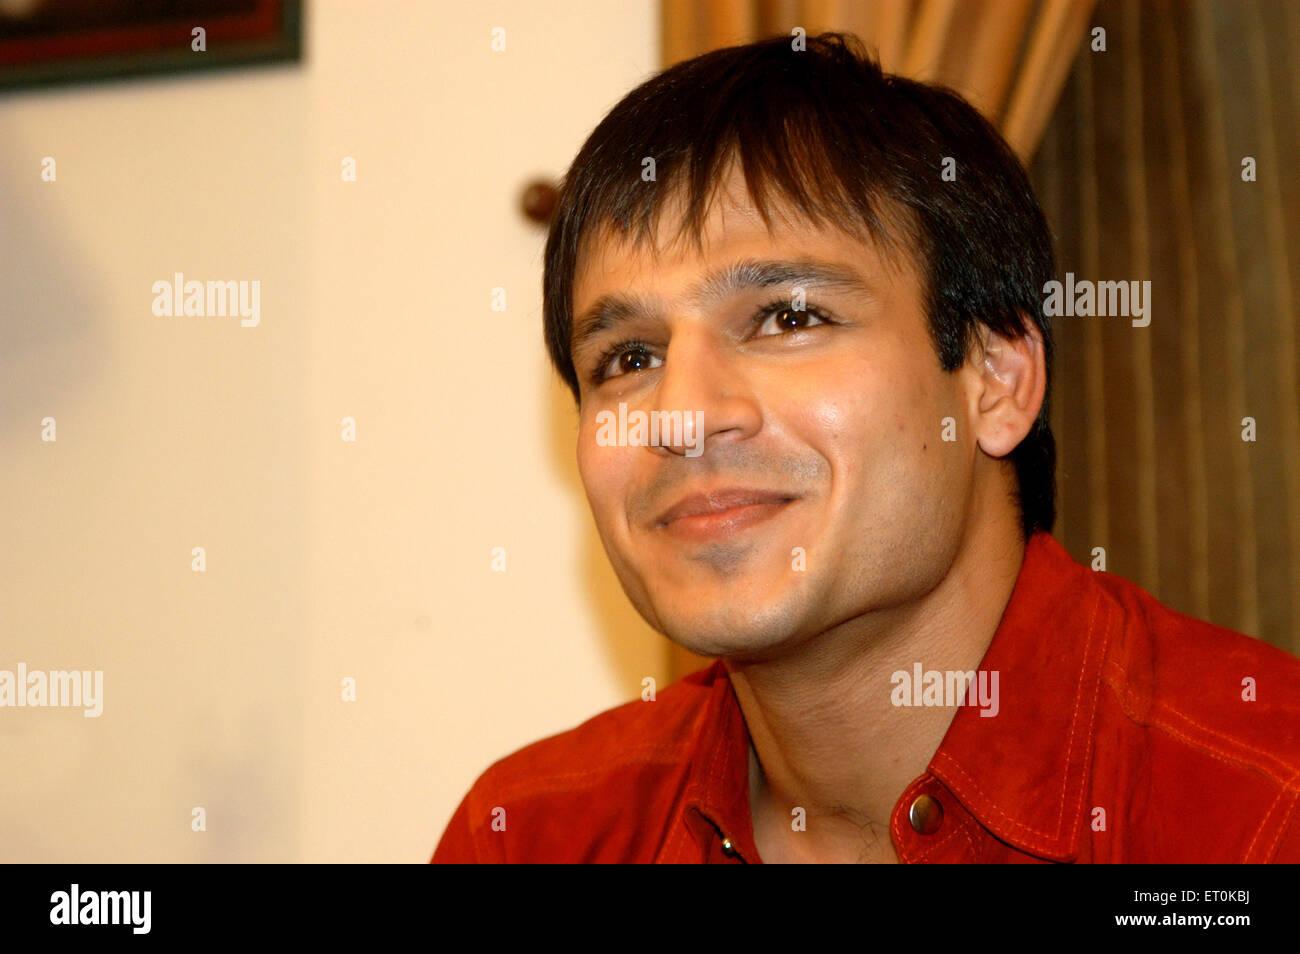 Indian film personality Vivek Oberoi smiling during press conference in Bombay Mumbai ; Maharashtra ; India NO MR - Stock Image